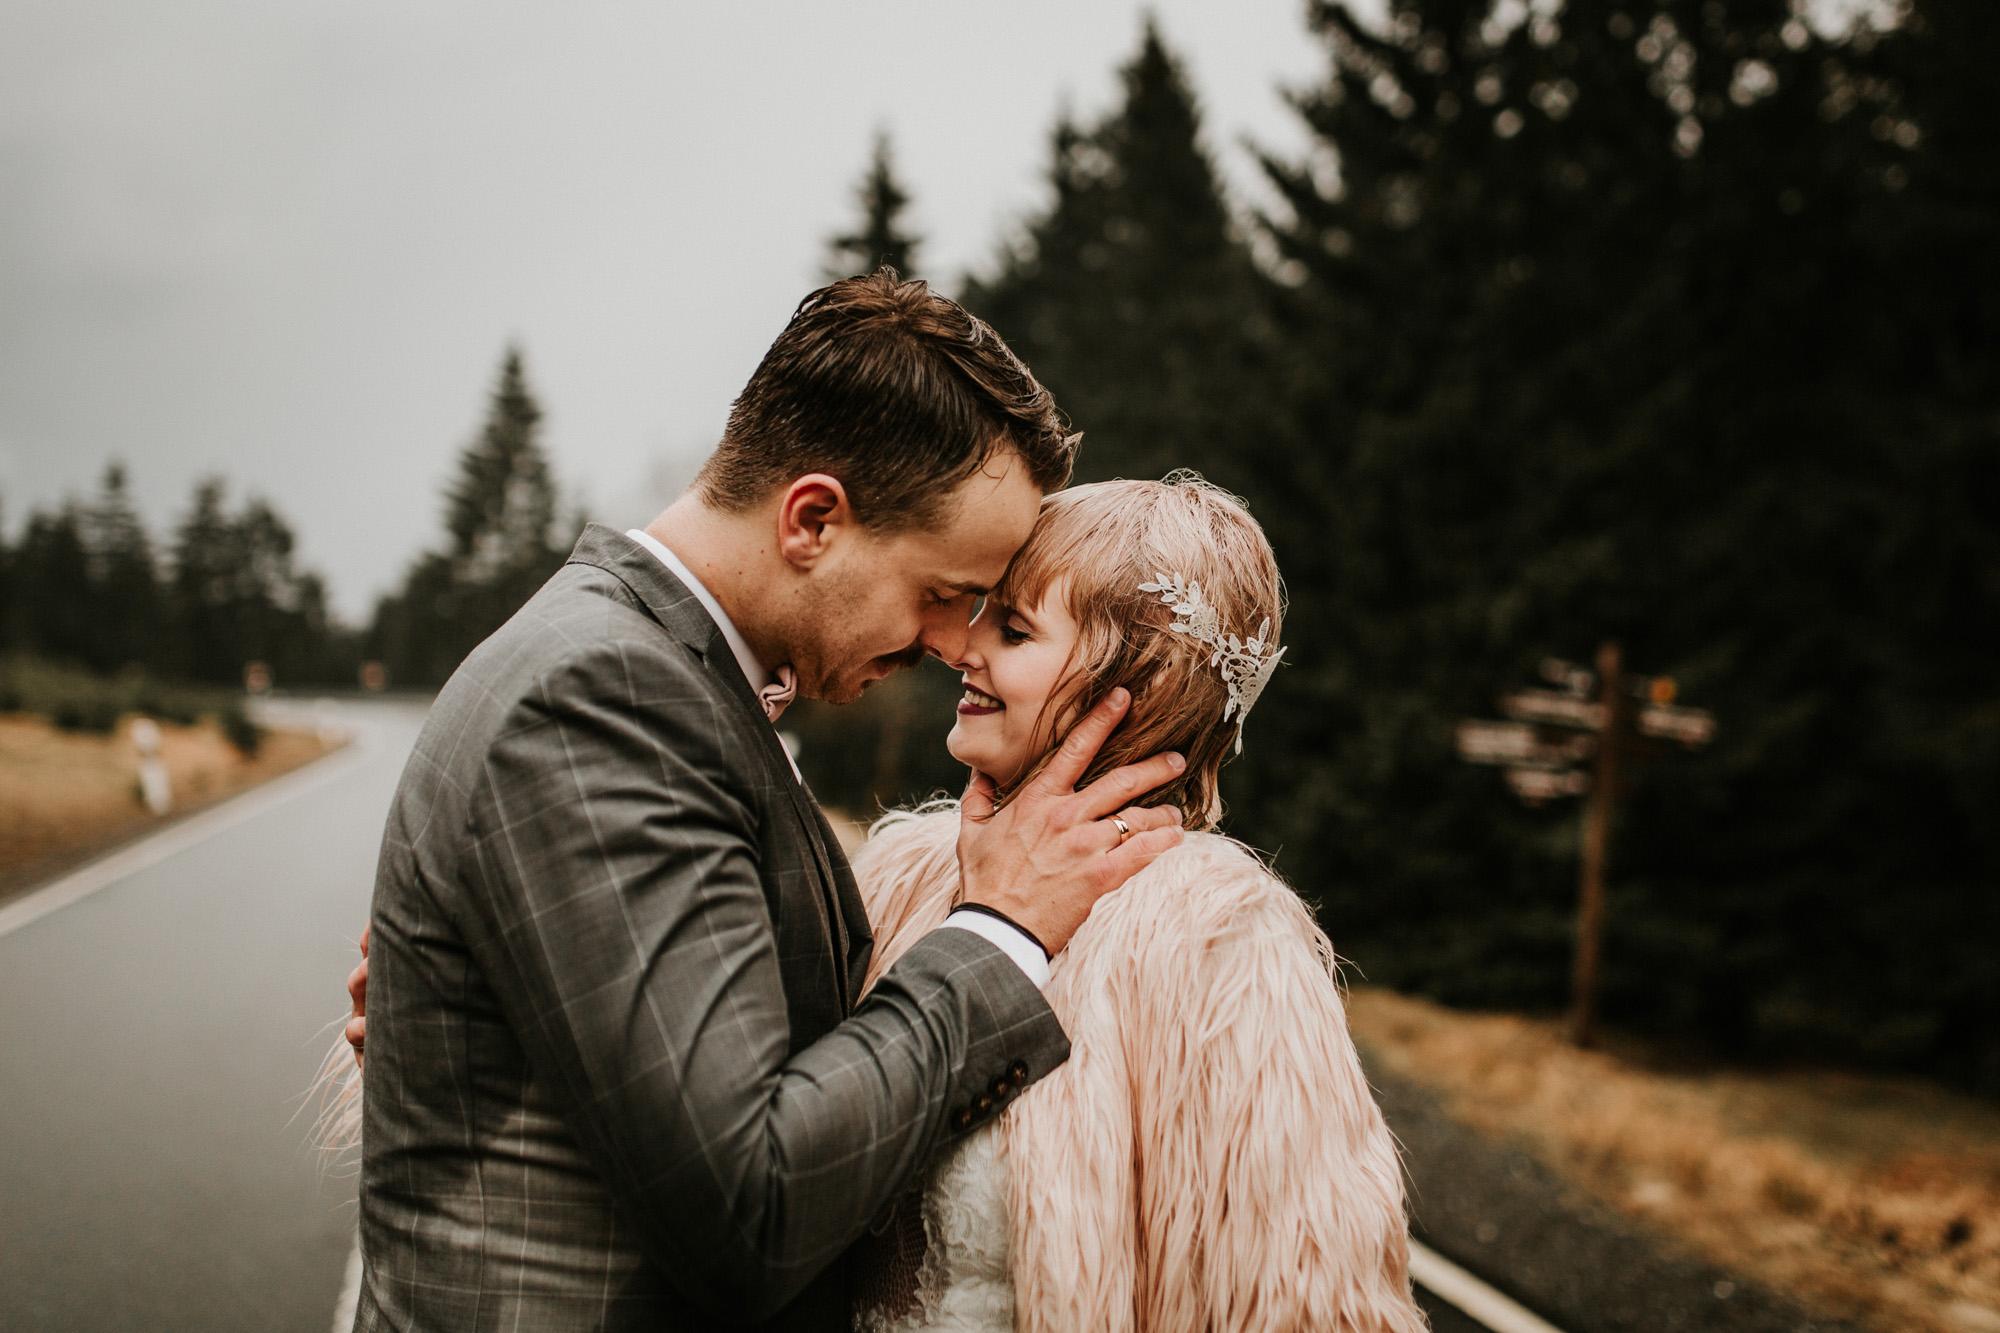 DanielaMarquardtPhotography_Hochzeitsfotograf_Düsseldorf_Köln_Mallorca_Bayern_Austria_Harz_LinaundMaik_Afterwedding-Shooting_Weddingphotographer_Ibiza_Tuskany_Italien_Toskana120